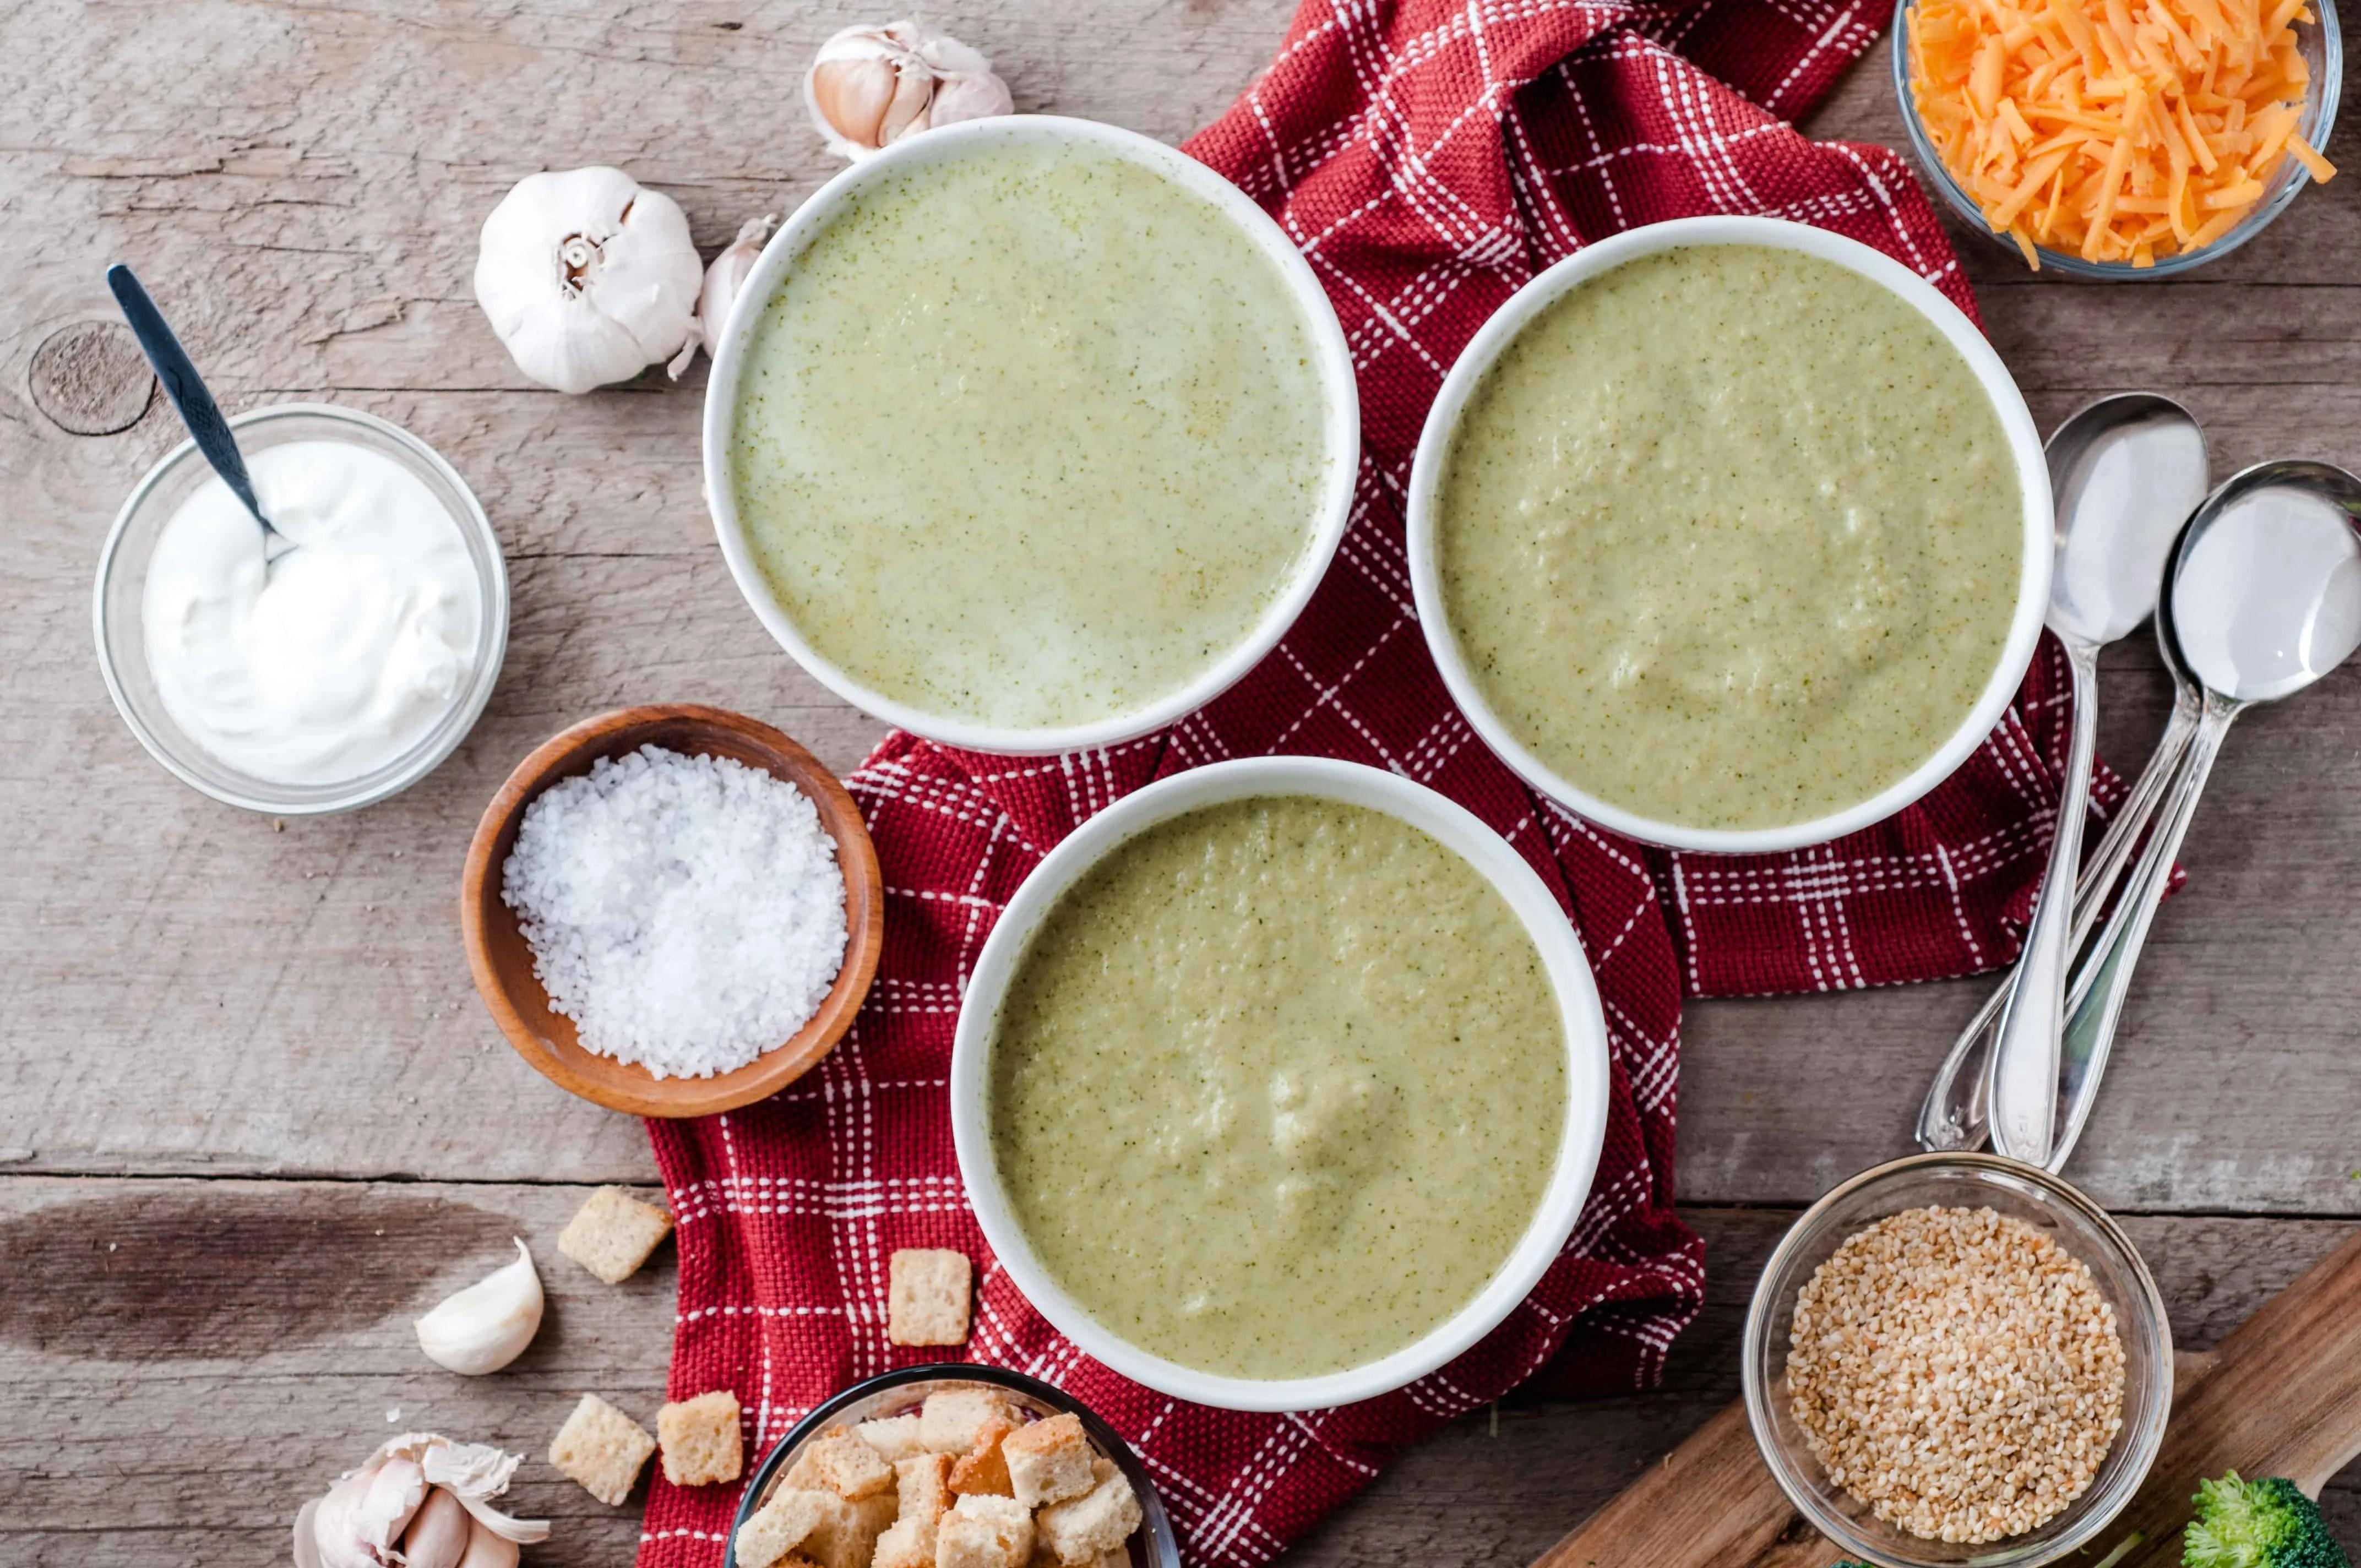 three bowls of Vegetarian Cream of Broccoli Soup